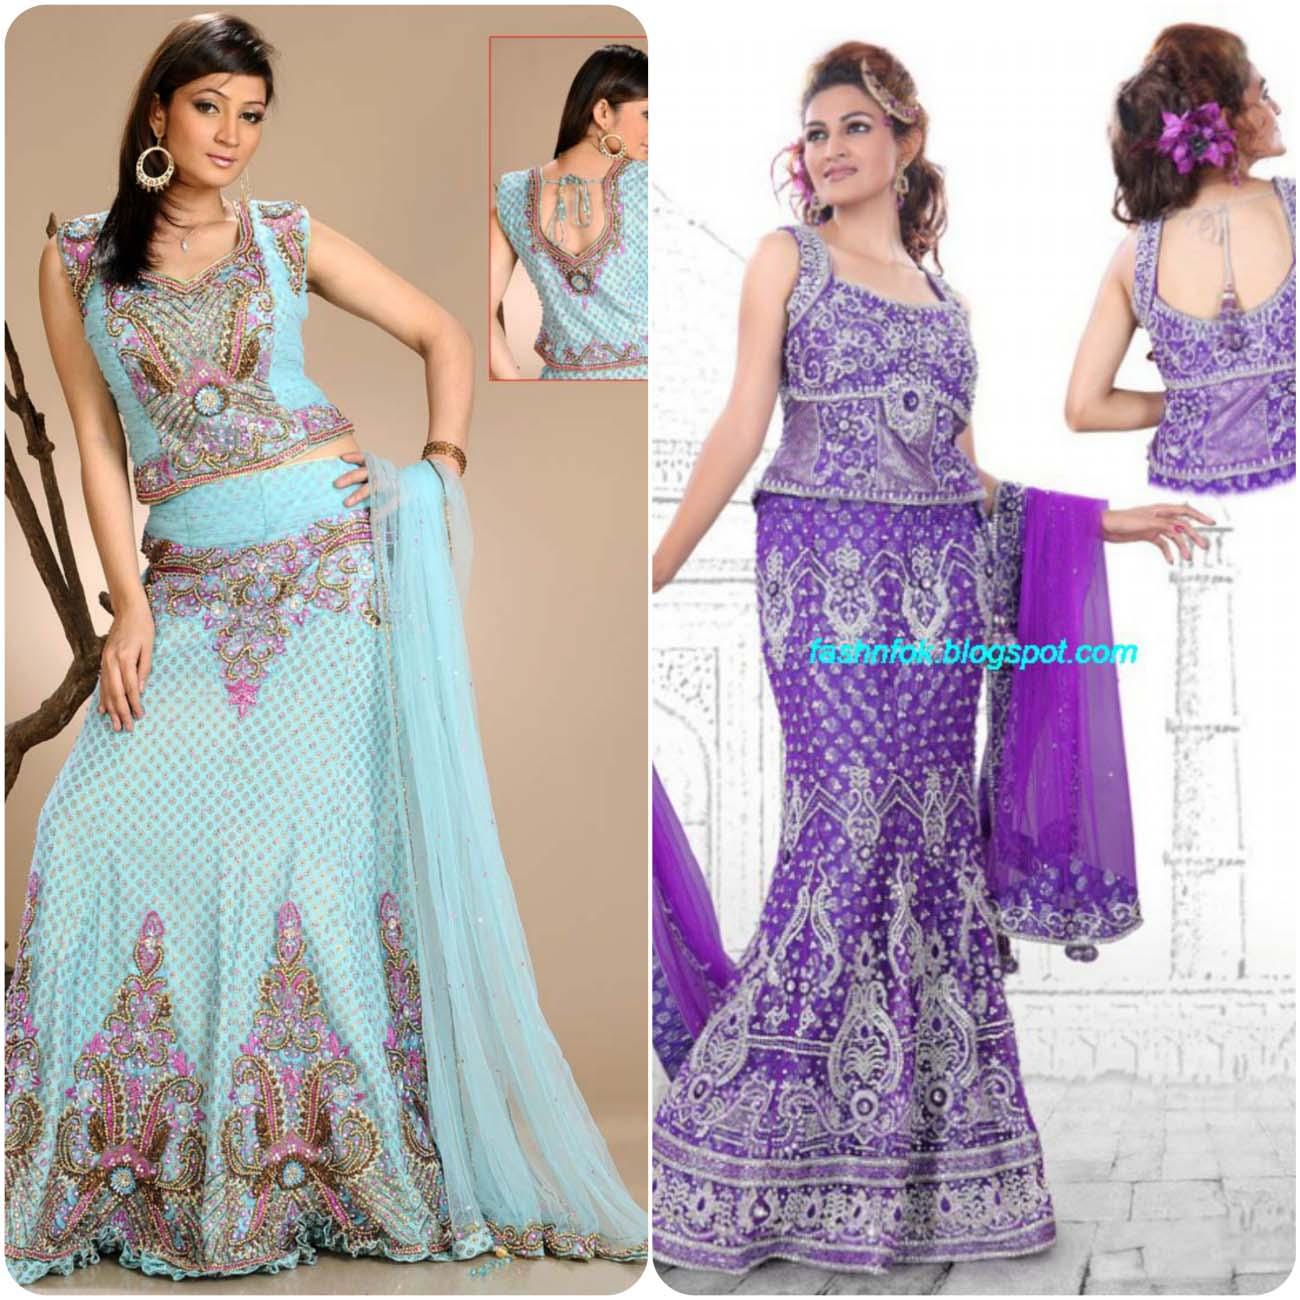 Embroidered Lehenga Choli Designs For Girls 2016-2017....styloplanet (11)